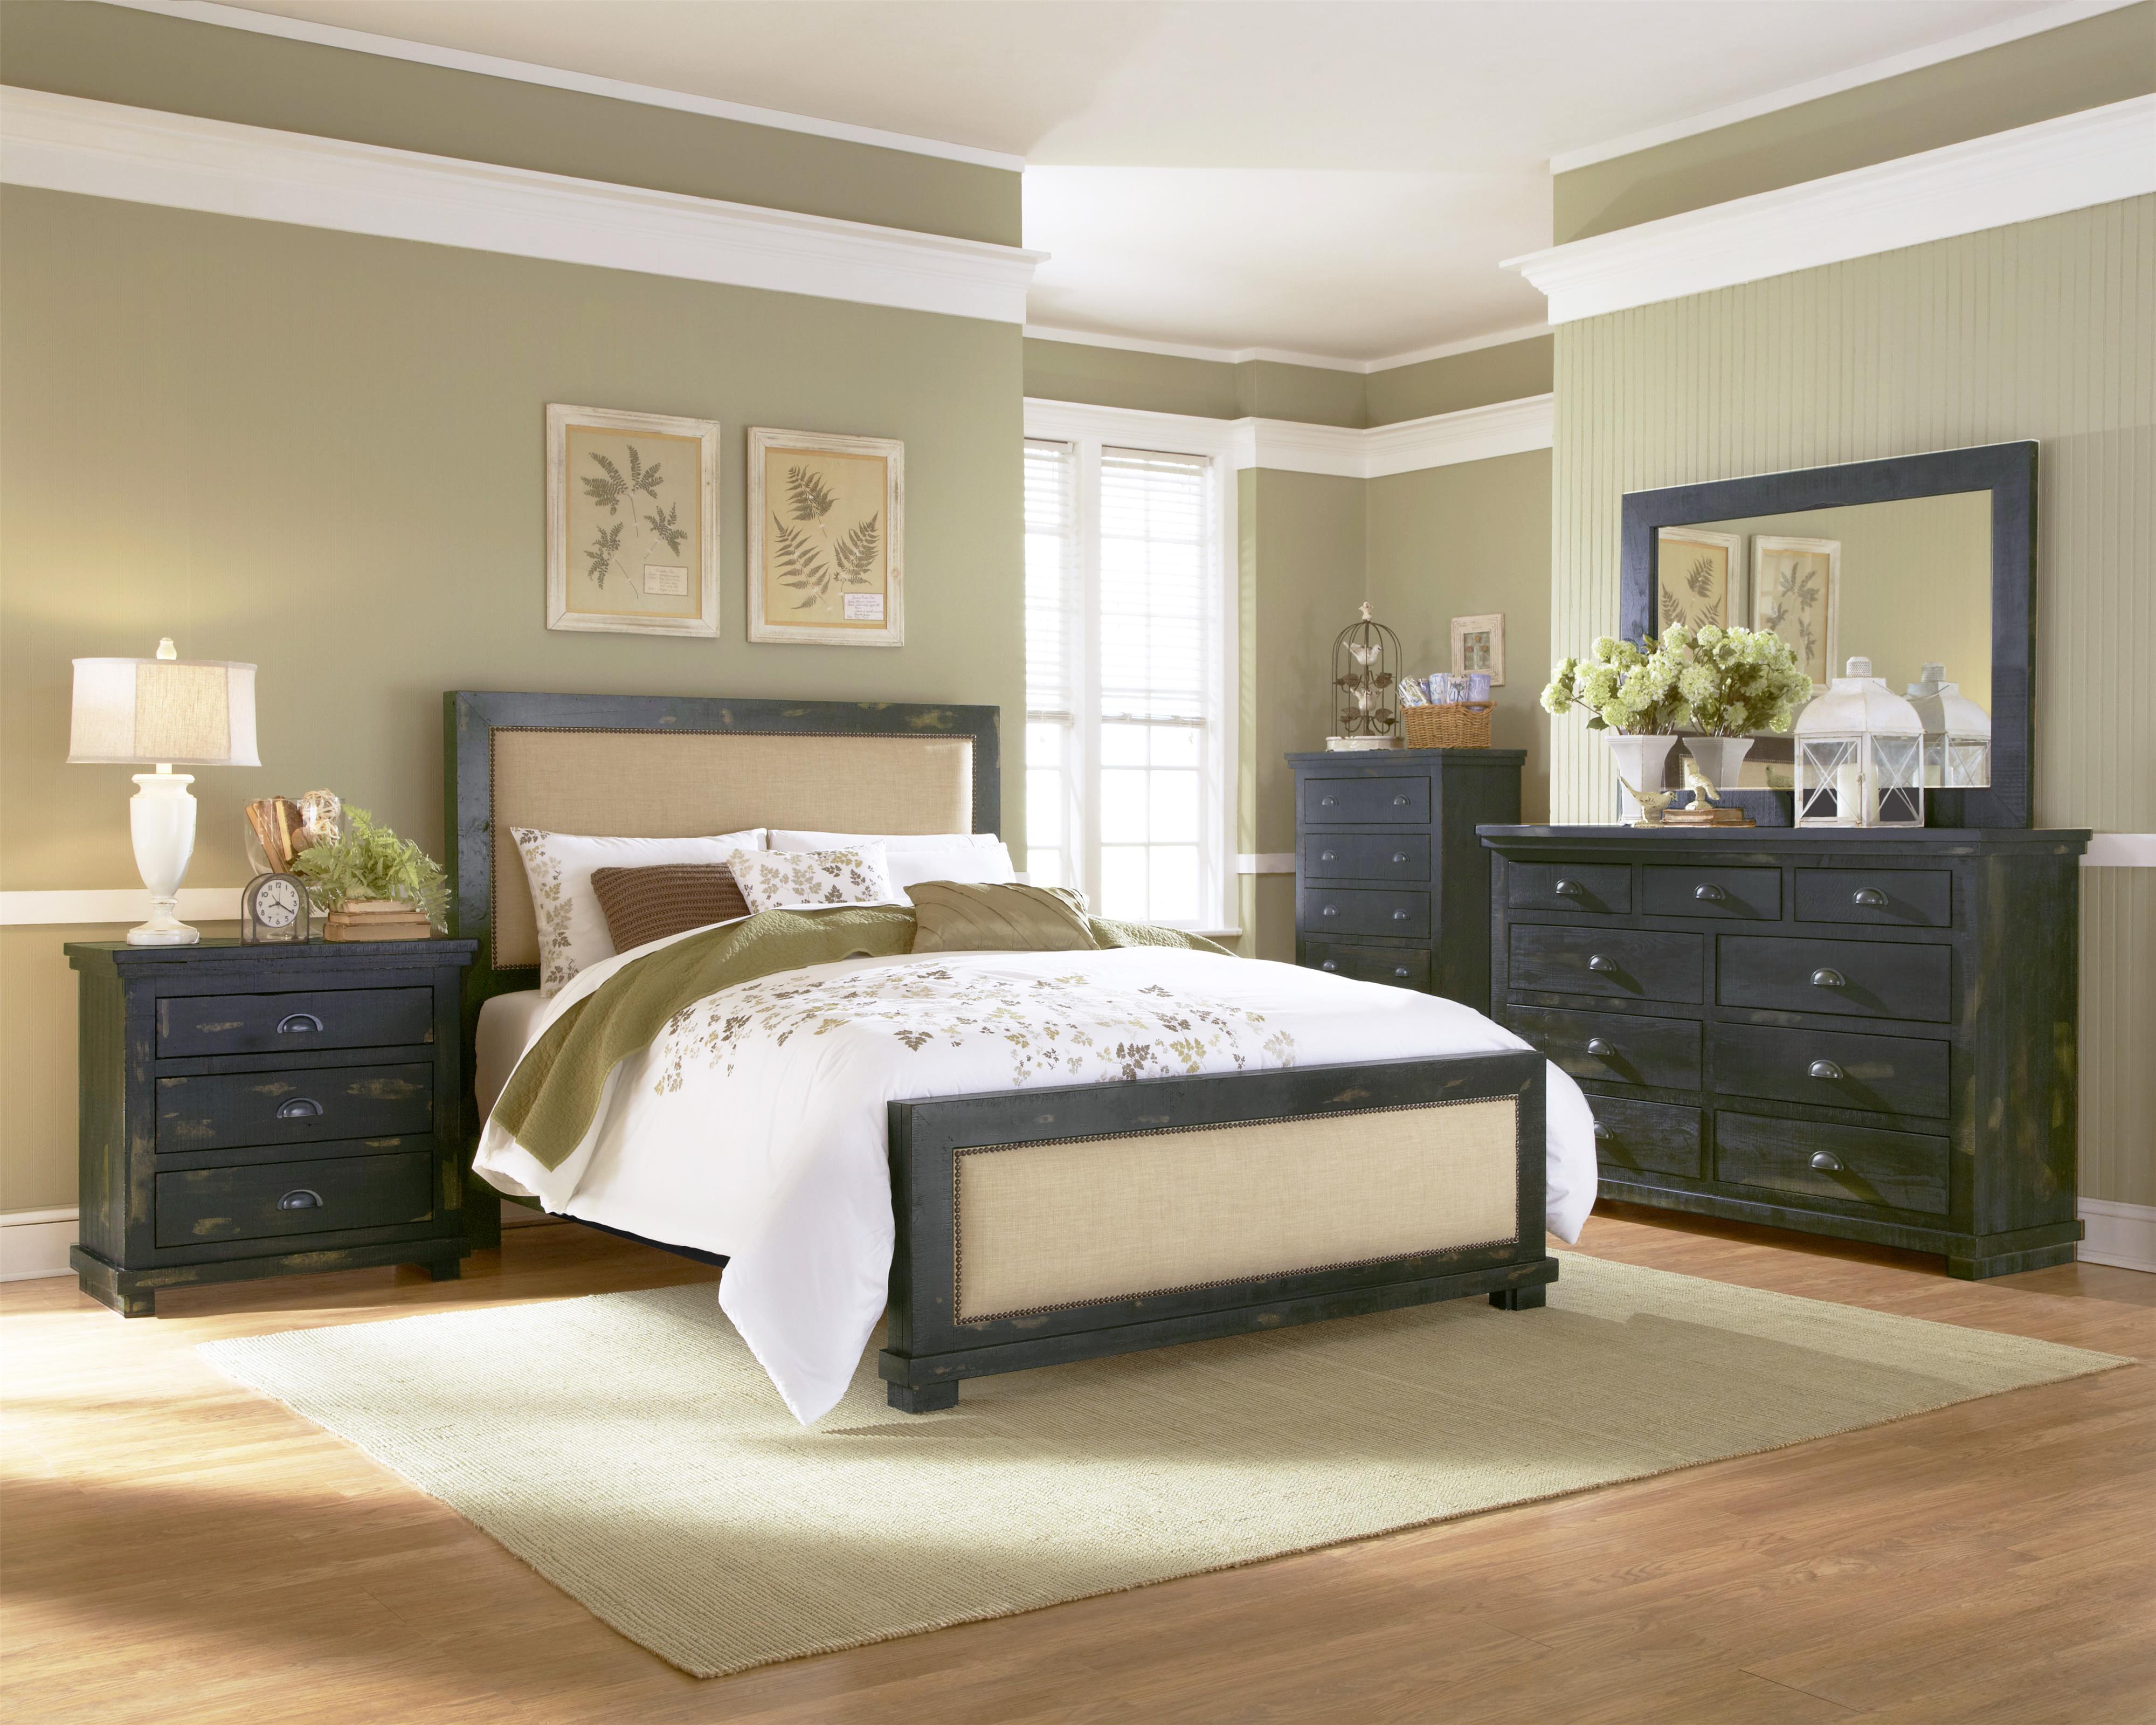 Bon Progressive Furniture Willow P612 14 Chest | Northeast Factory Direct |  Drawer Chests Cleveland, Eastlake, Westlake, Mentor, Medina, Ohio